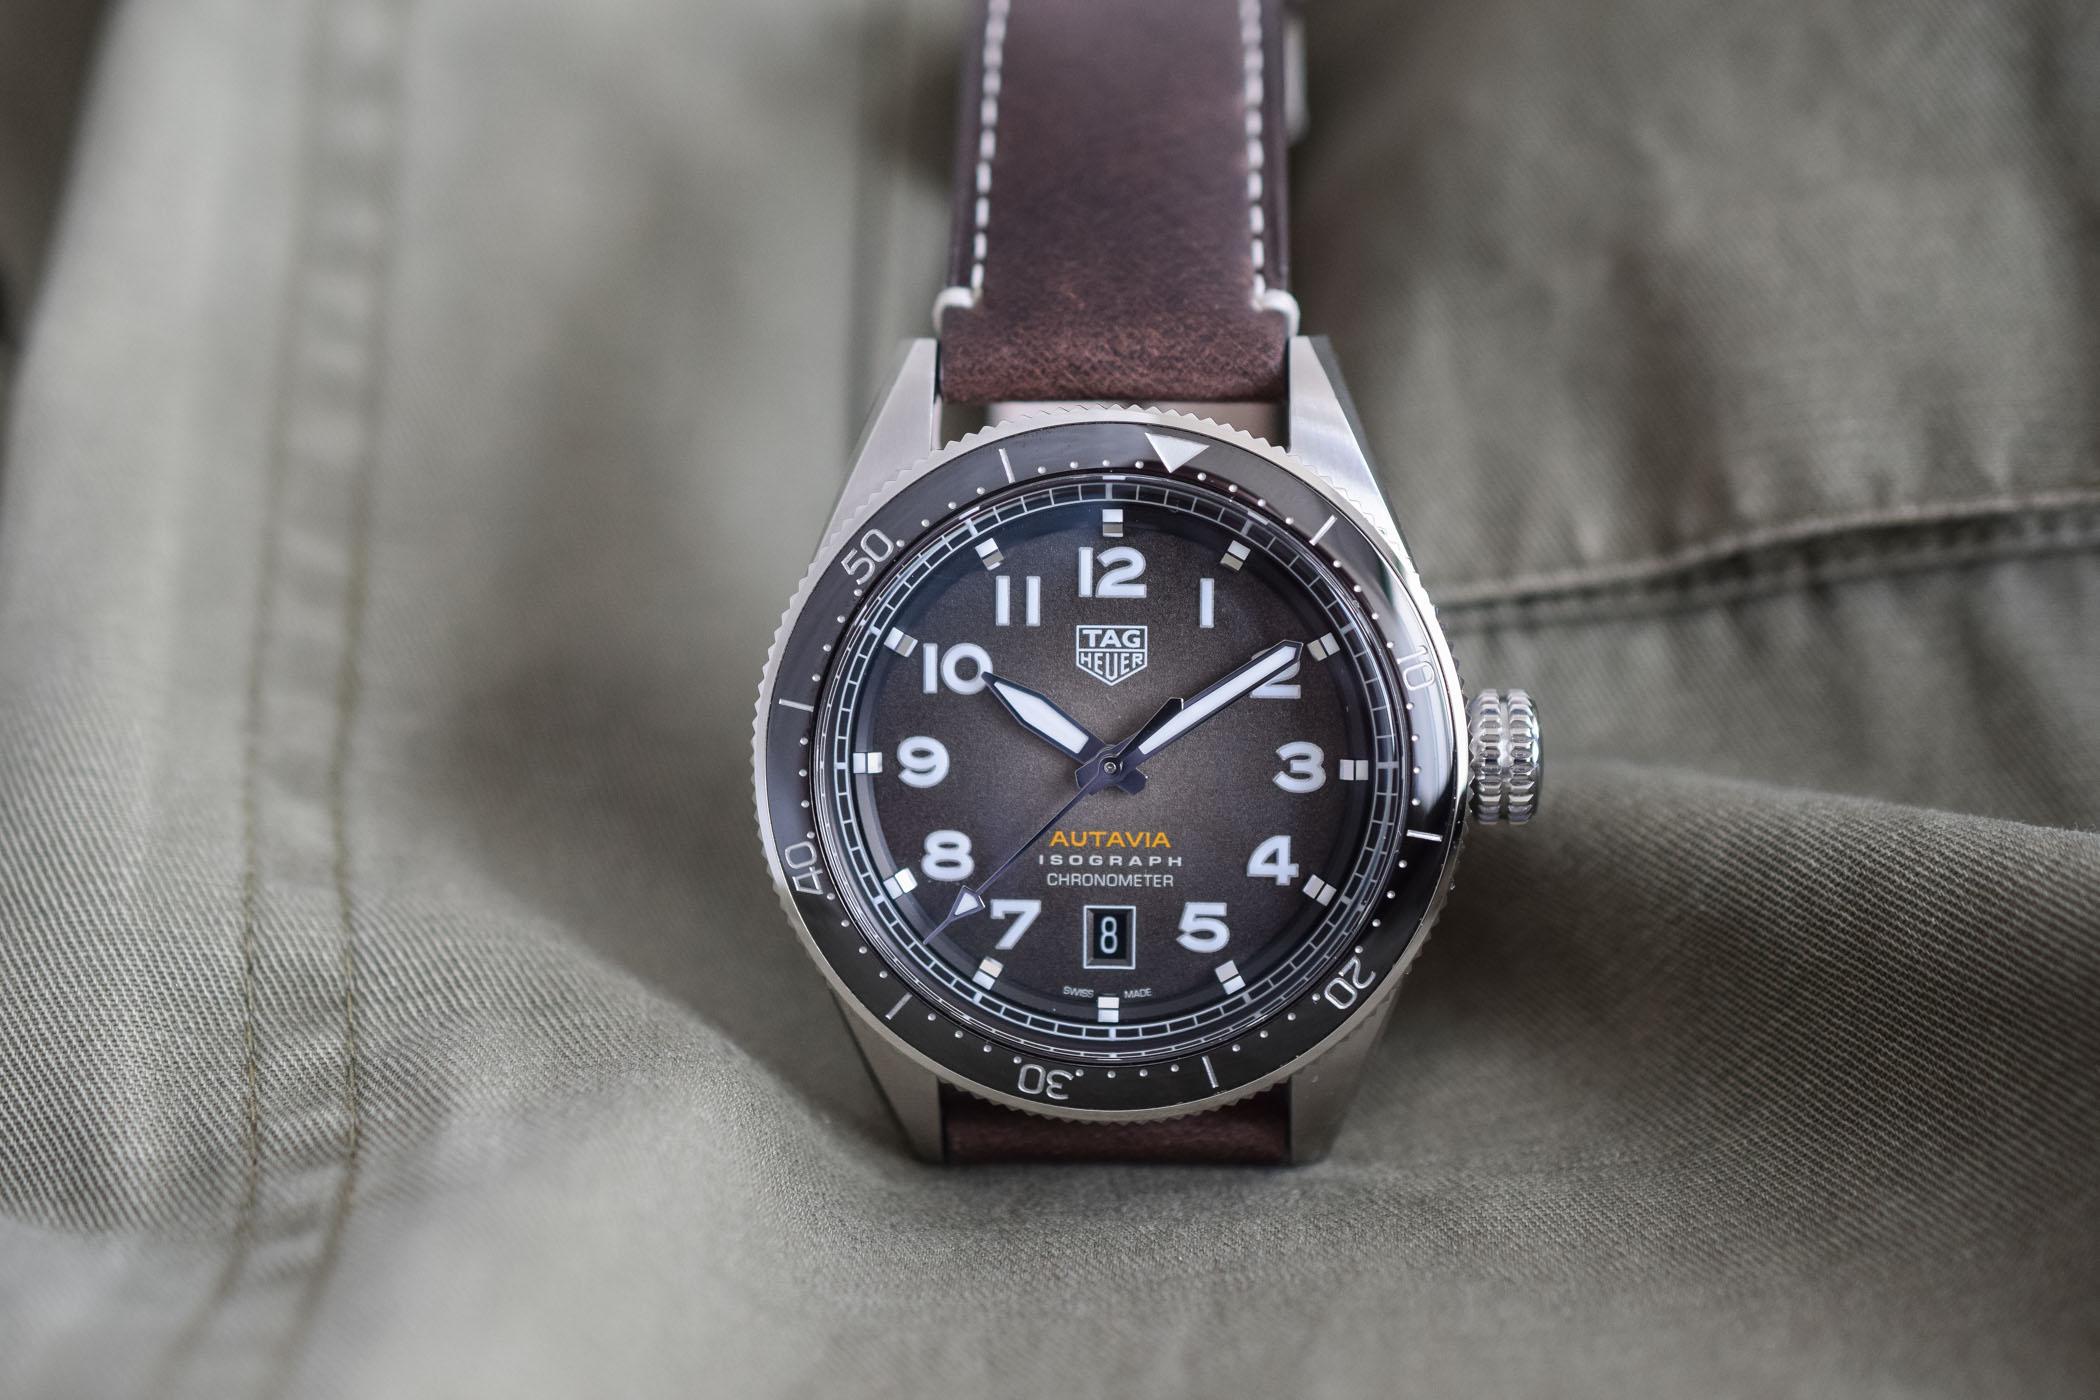 TAG Heuer Autavia Isograph Chronometer - Baselworld 2019 - 8